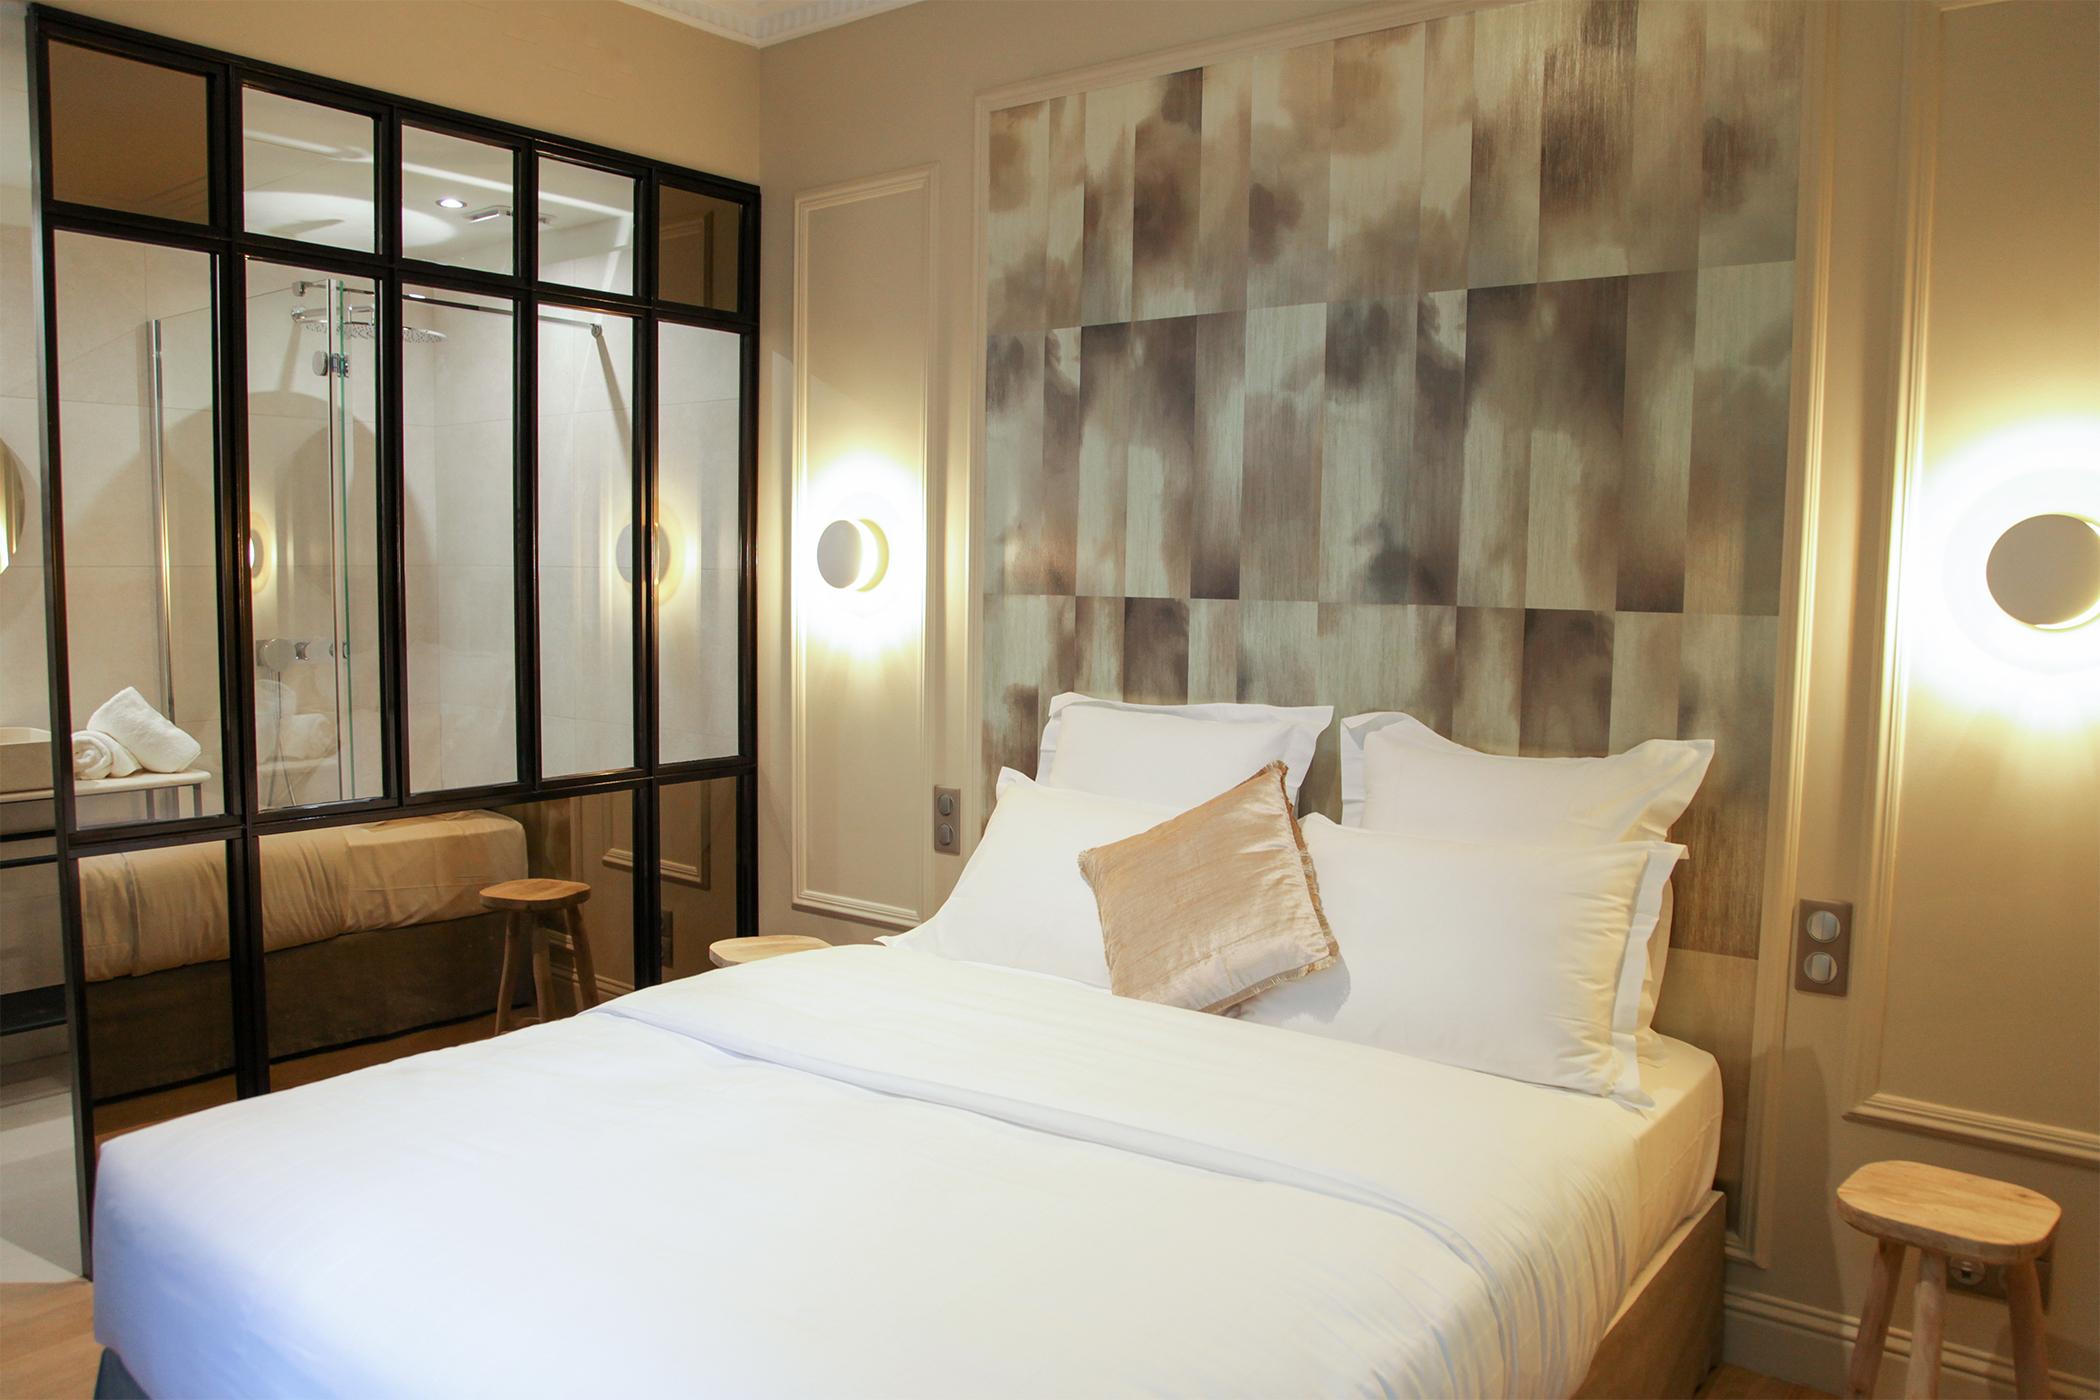 galerie_0001_hotelsingulier-47